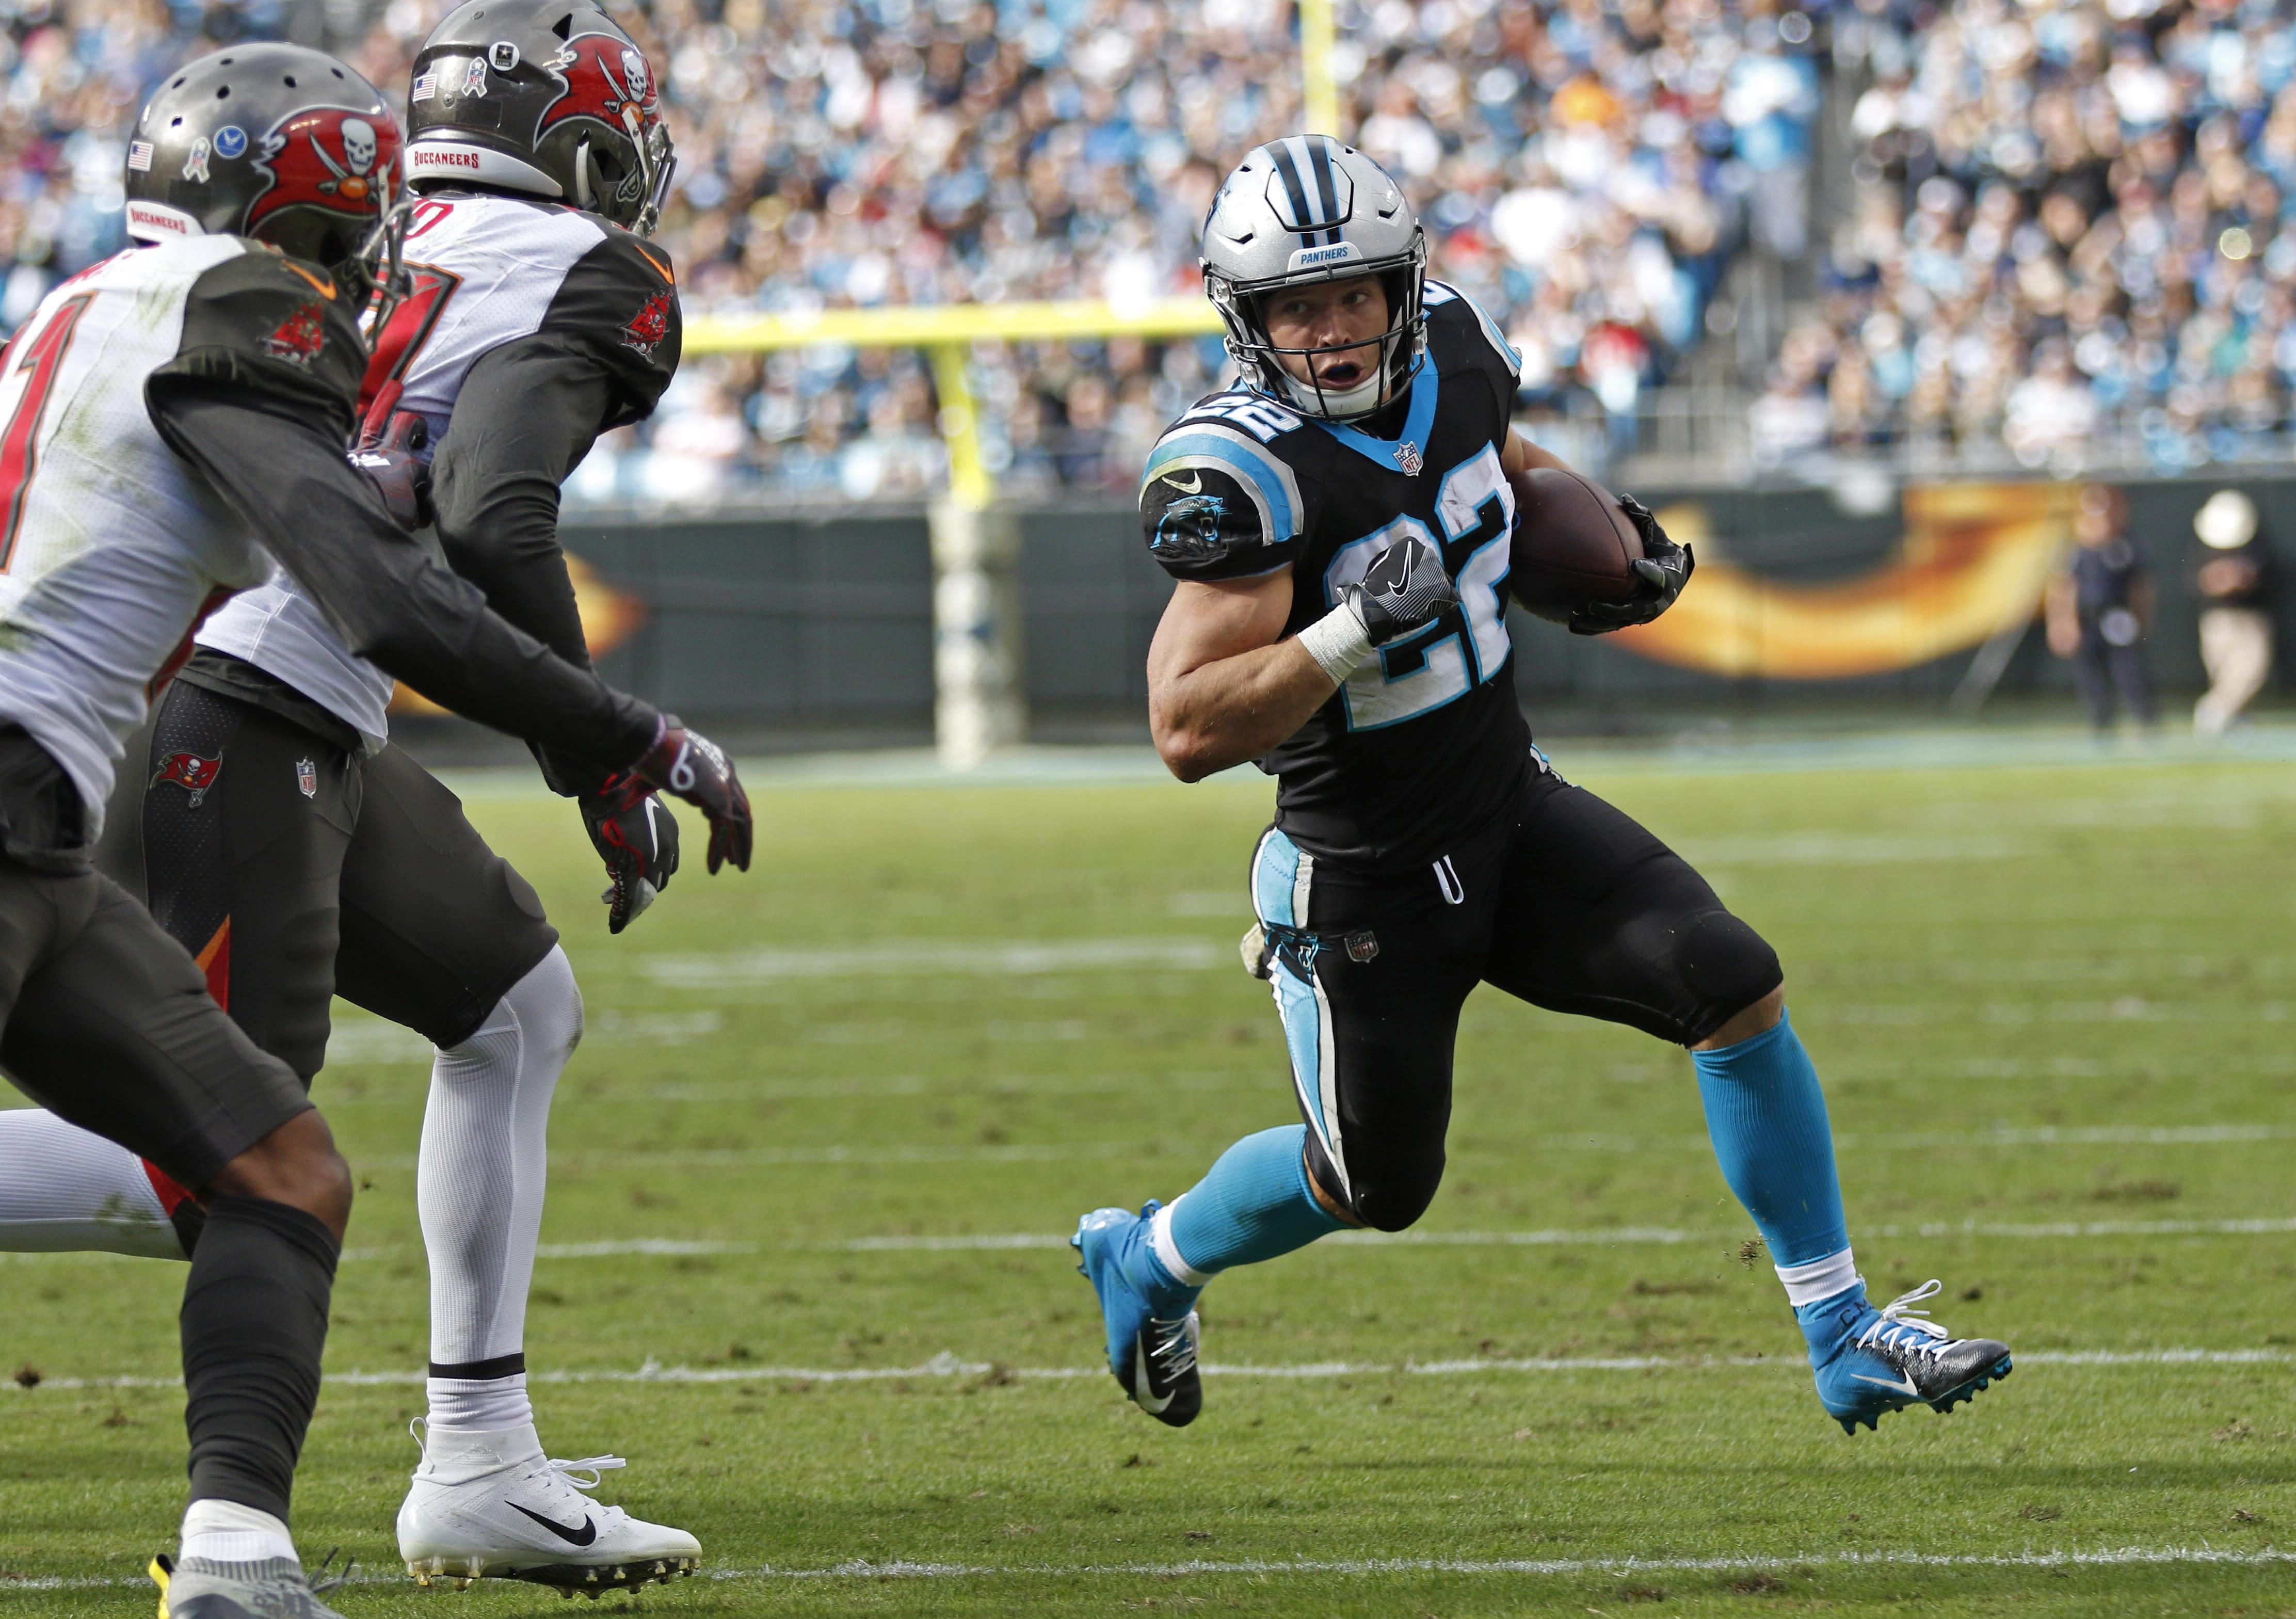 Newton, McCaffrey lead Panthers past Bucs 42-28 - News